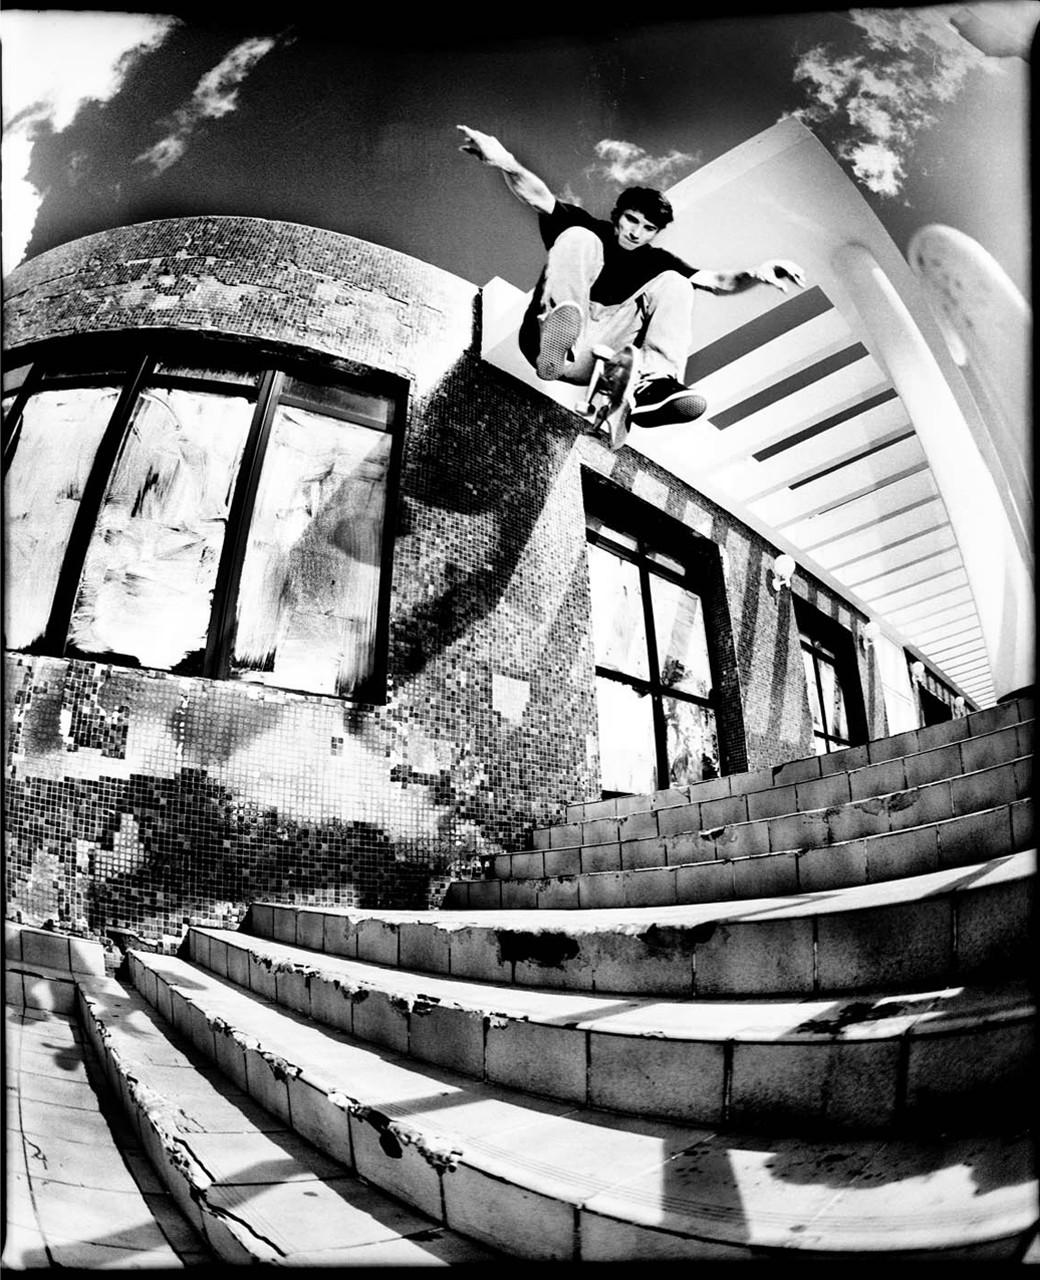 SKATE-STREET-PHOTOGRAPHY-23-JUANMI-MARQUEZ-1761x1280-1761x1280